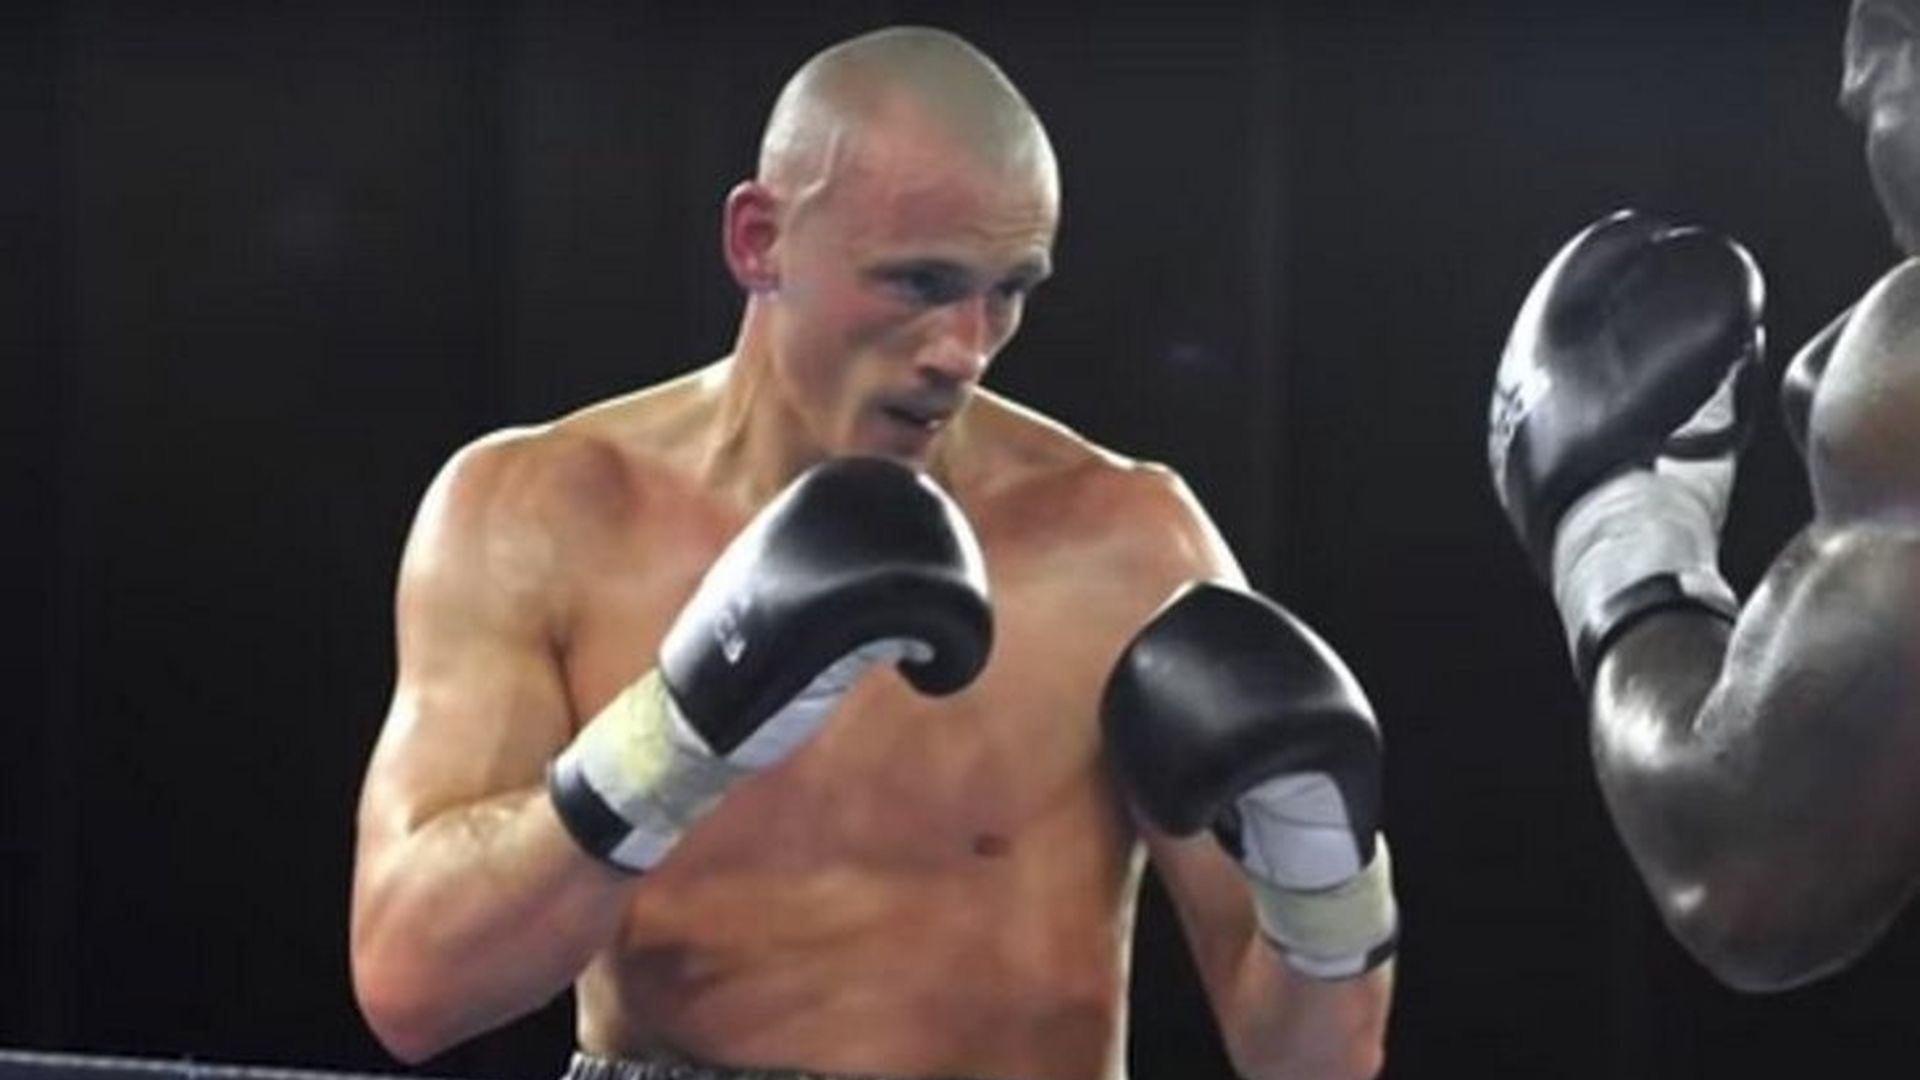 Година затвор за бивш боксьор, атакувал полицаи в Париж